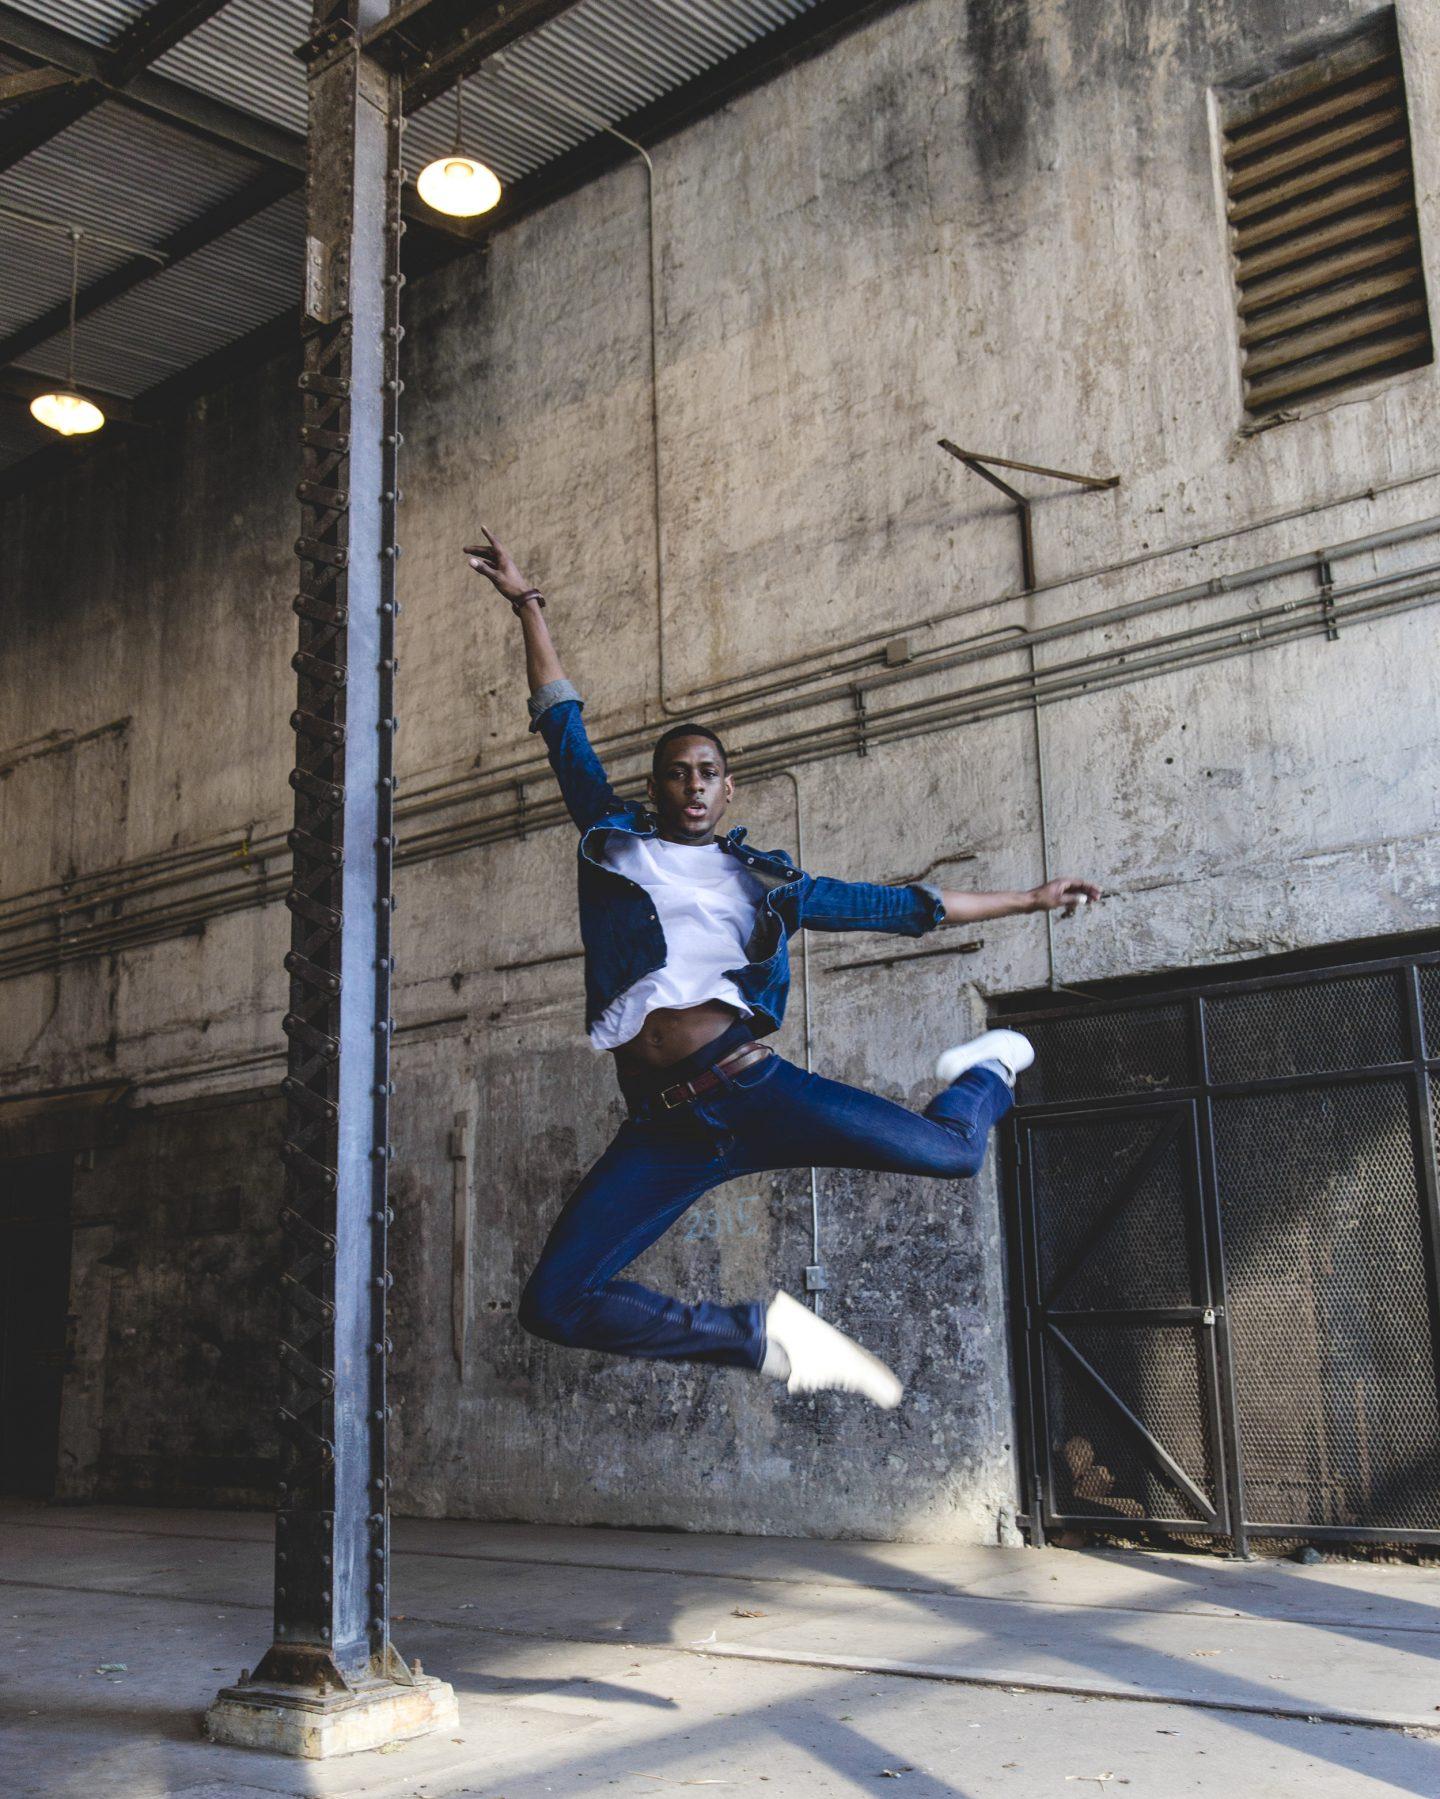 leap, jump, blog, blogger, writer, staceessmoothie, stacees smoothie, stacee's smoothie, black dancer, black man, broadway, broadway show, broadway dancer, black man, black dancer, black dancers matter, musical theater, musical theatre, theater, theatre, chorus boy, performing arts, darius barnes, broadway black, antonyo awards, inaugural antonyo awards, dance, showtime, show business, new york, new york new york, NYC, new york city, hottest chorus boy, hottest chorus boy in Broadway, hottest chorus boys in Broadway, 10 hottest chorus boys in Broadway, male dancer, black male dancer, black man dance, professional dancer